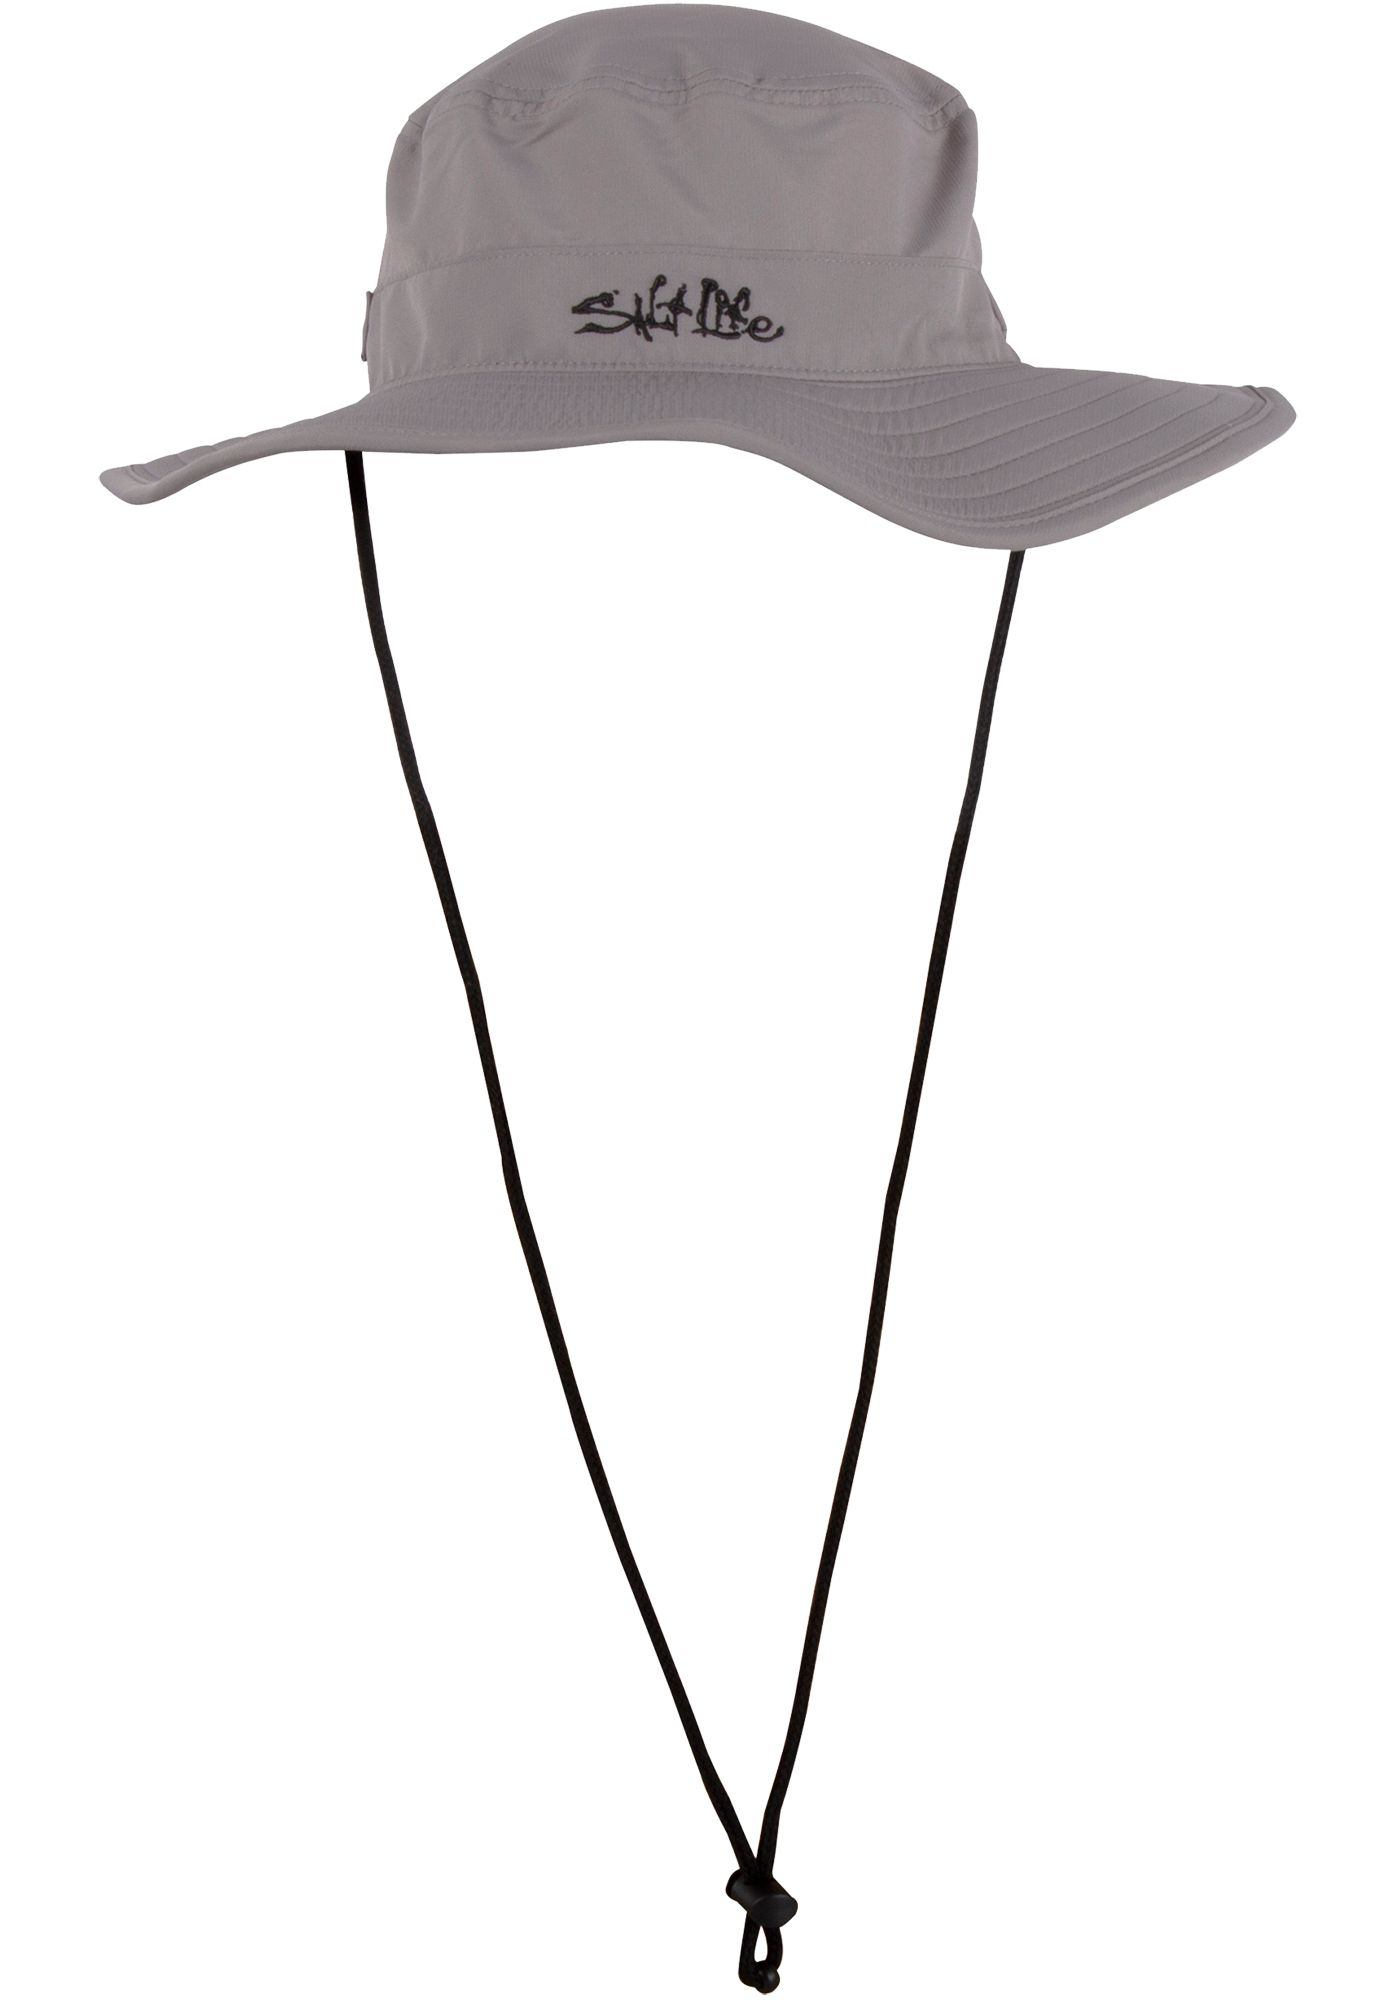 Salt Life Men's Sand Bar Boonie Hat